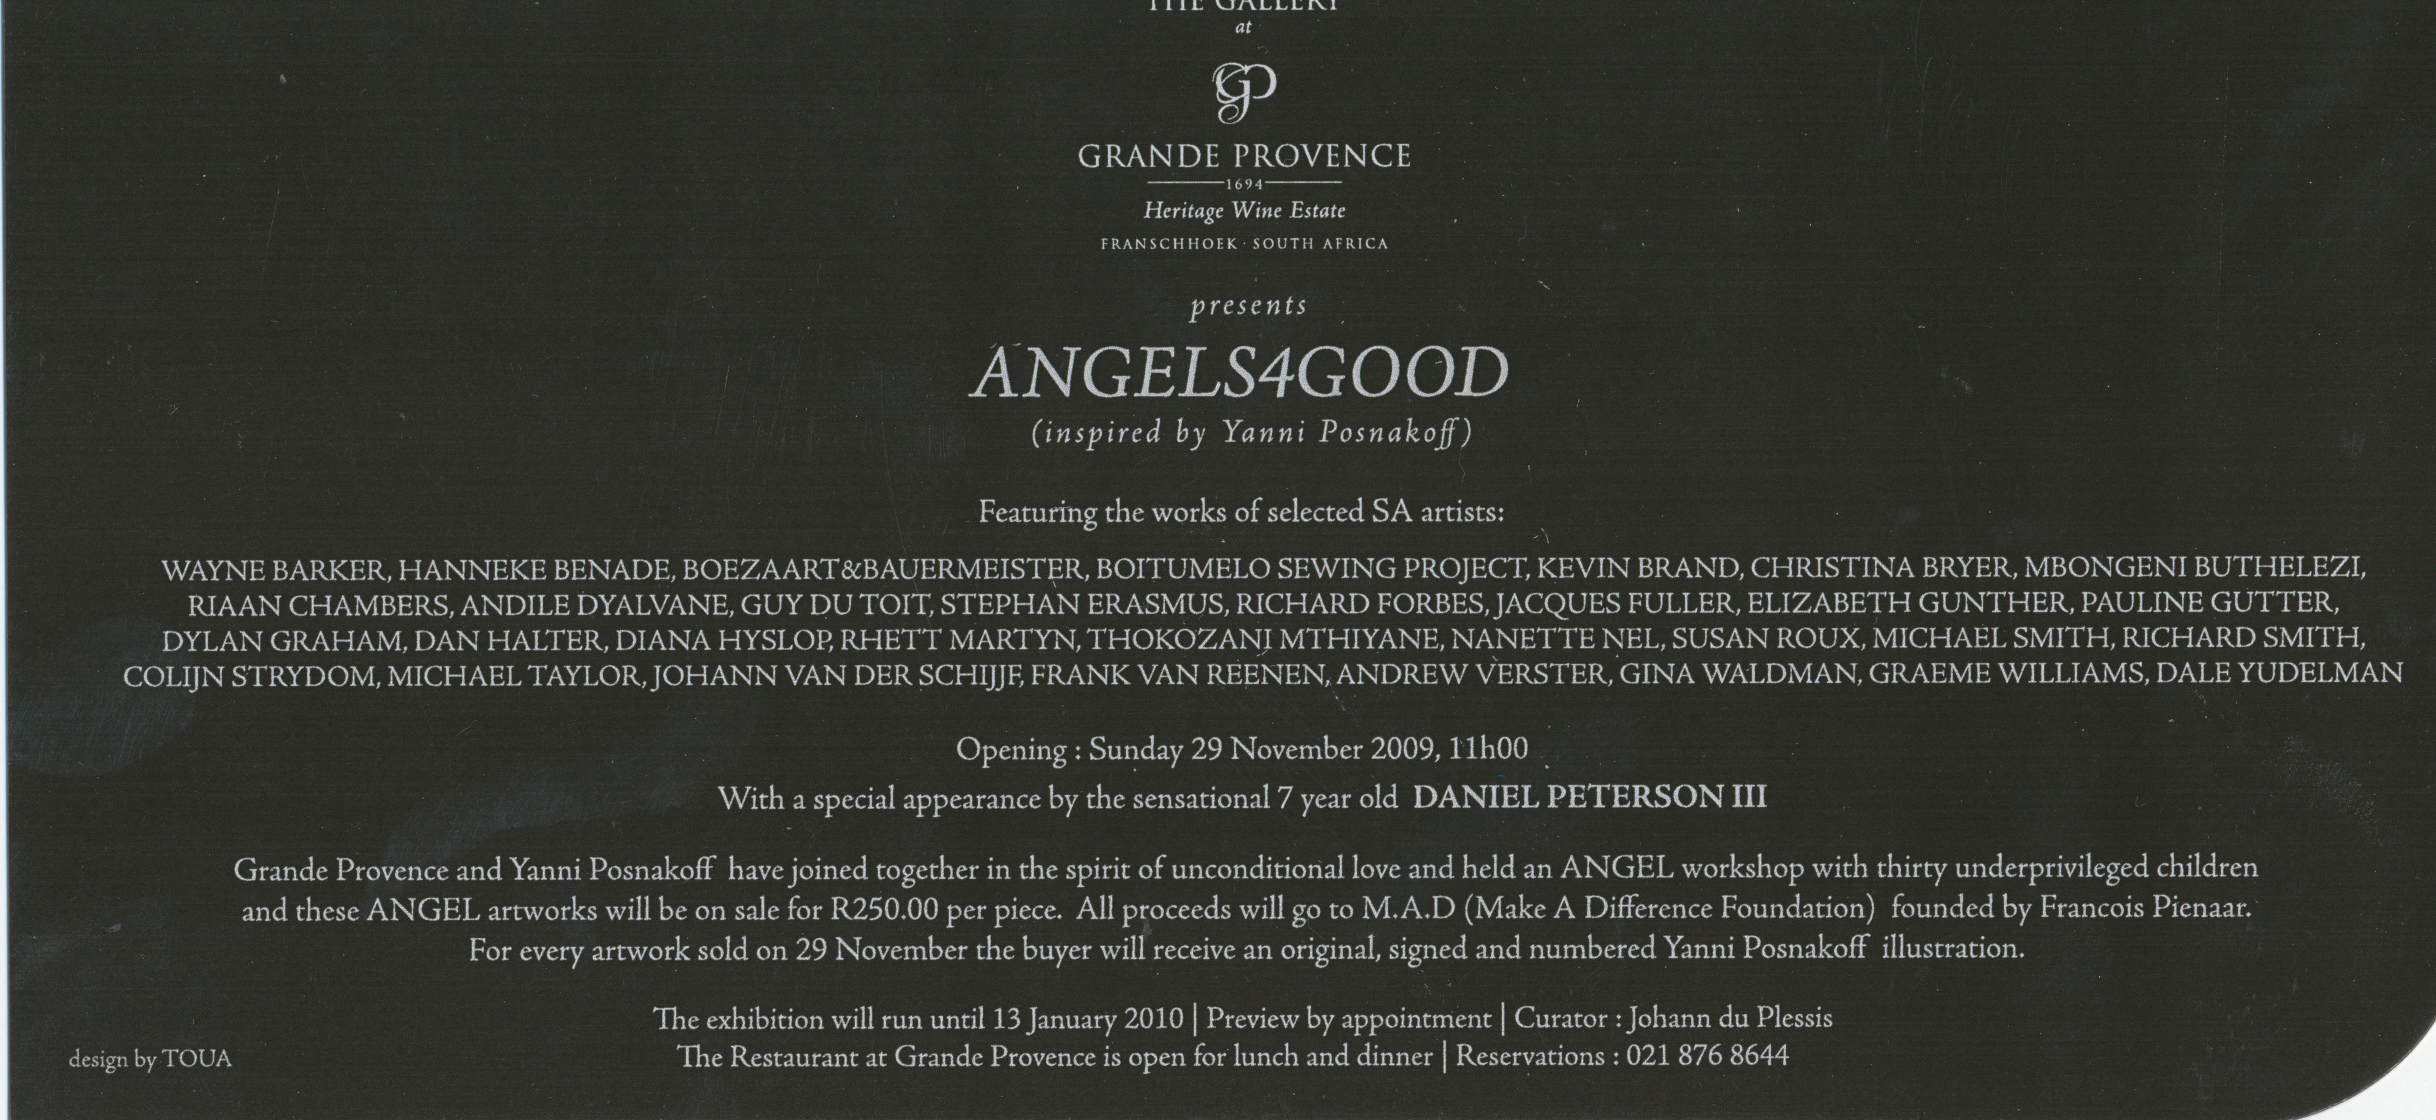 ANGLES 4 GOOD GROUP EXHIBITION GRANDE PROVENCE ESTATE NOV 2009